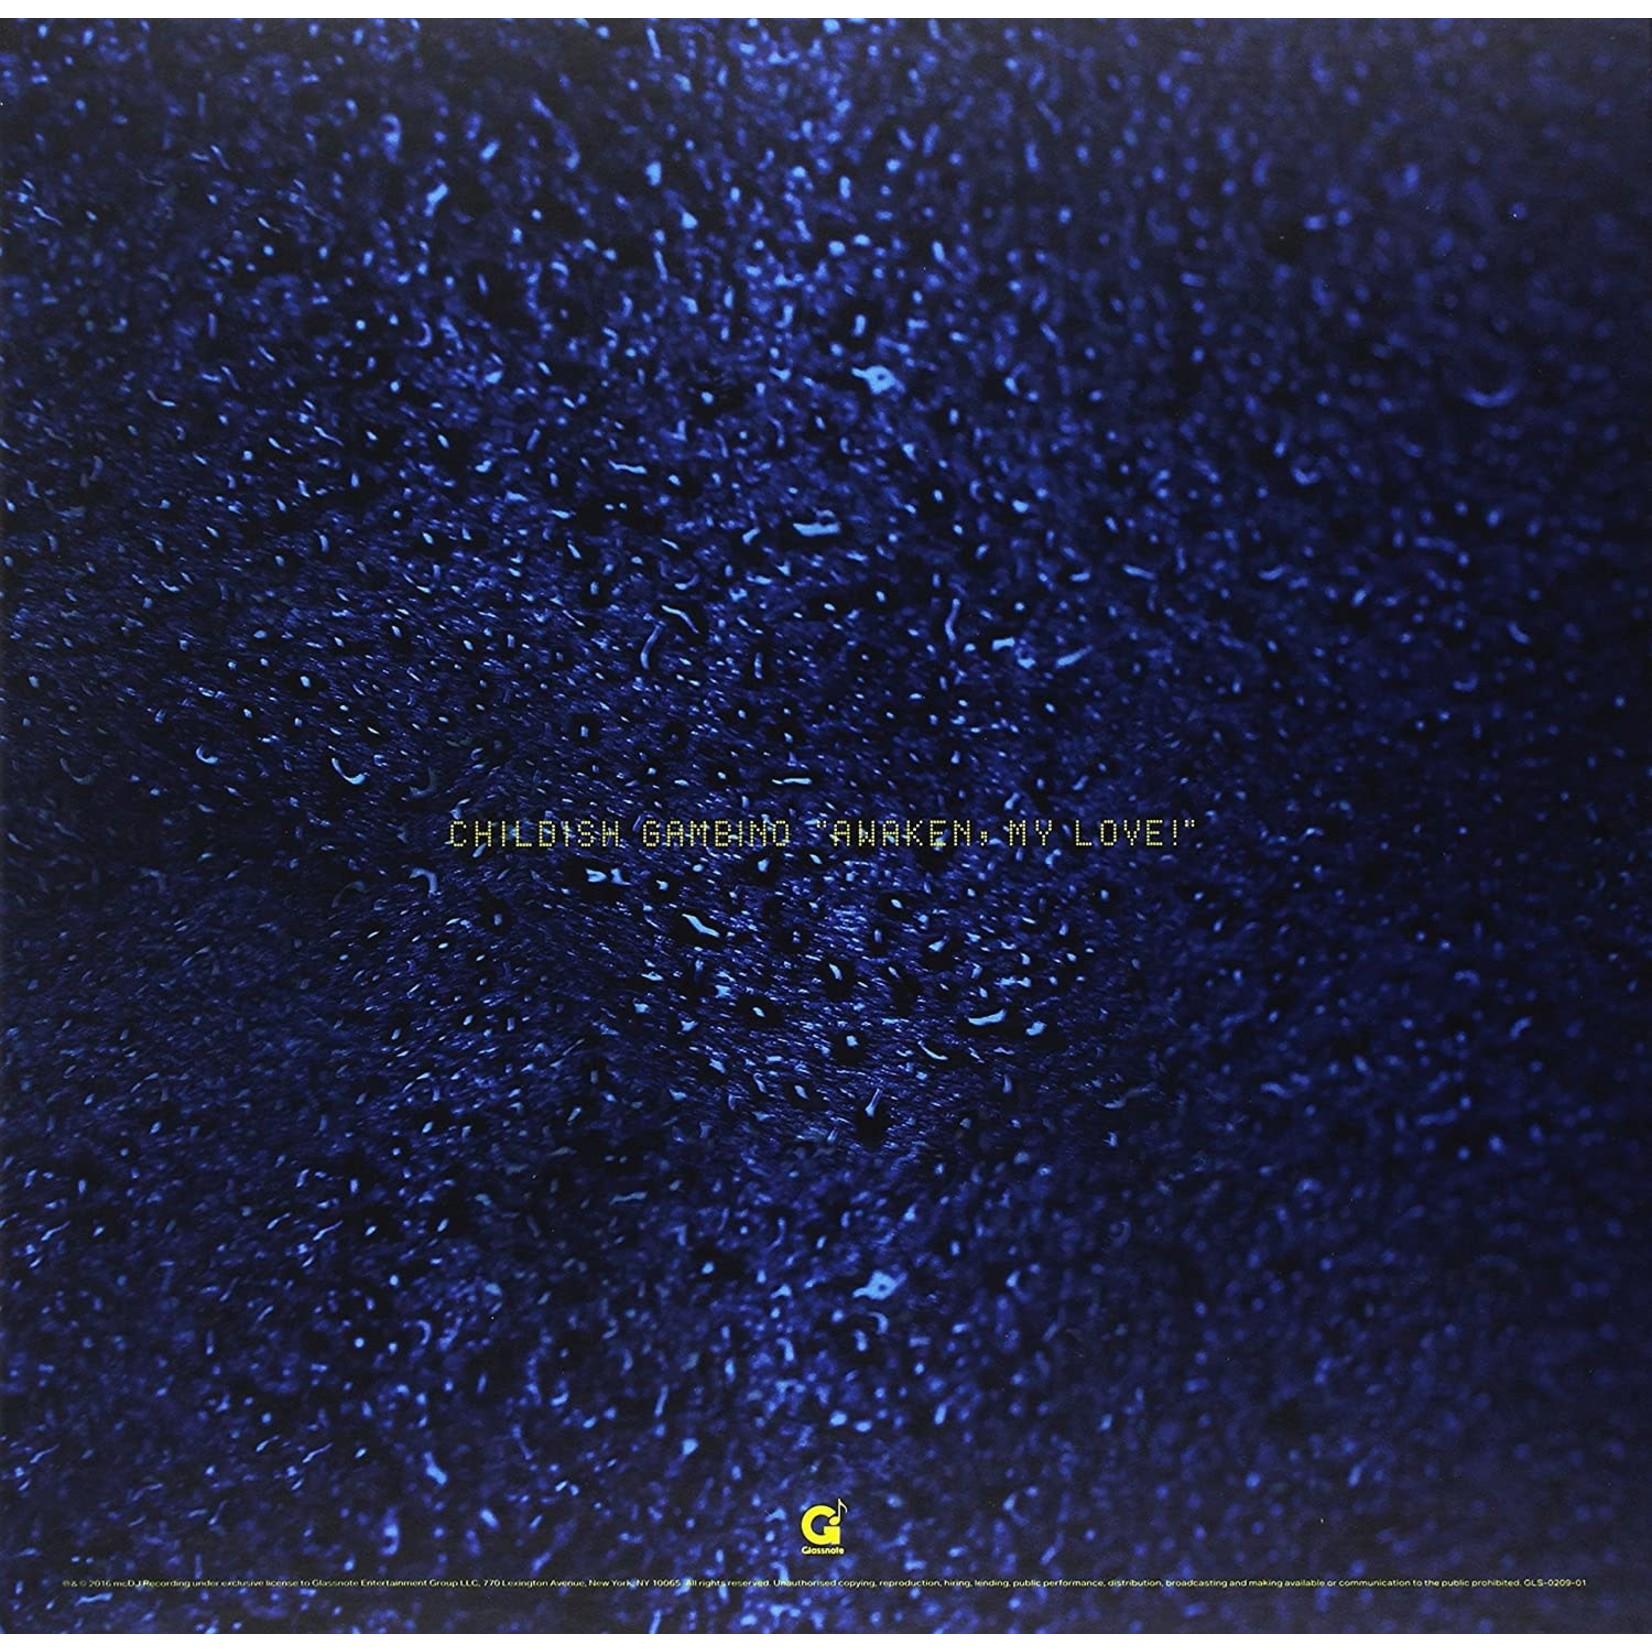 CHILDISH GAMBINO AWAKEN, MY LOVE (LTD EDITION VIRTUAL REALITY VINYL, 2LP)